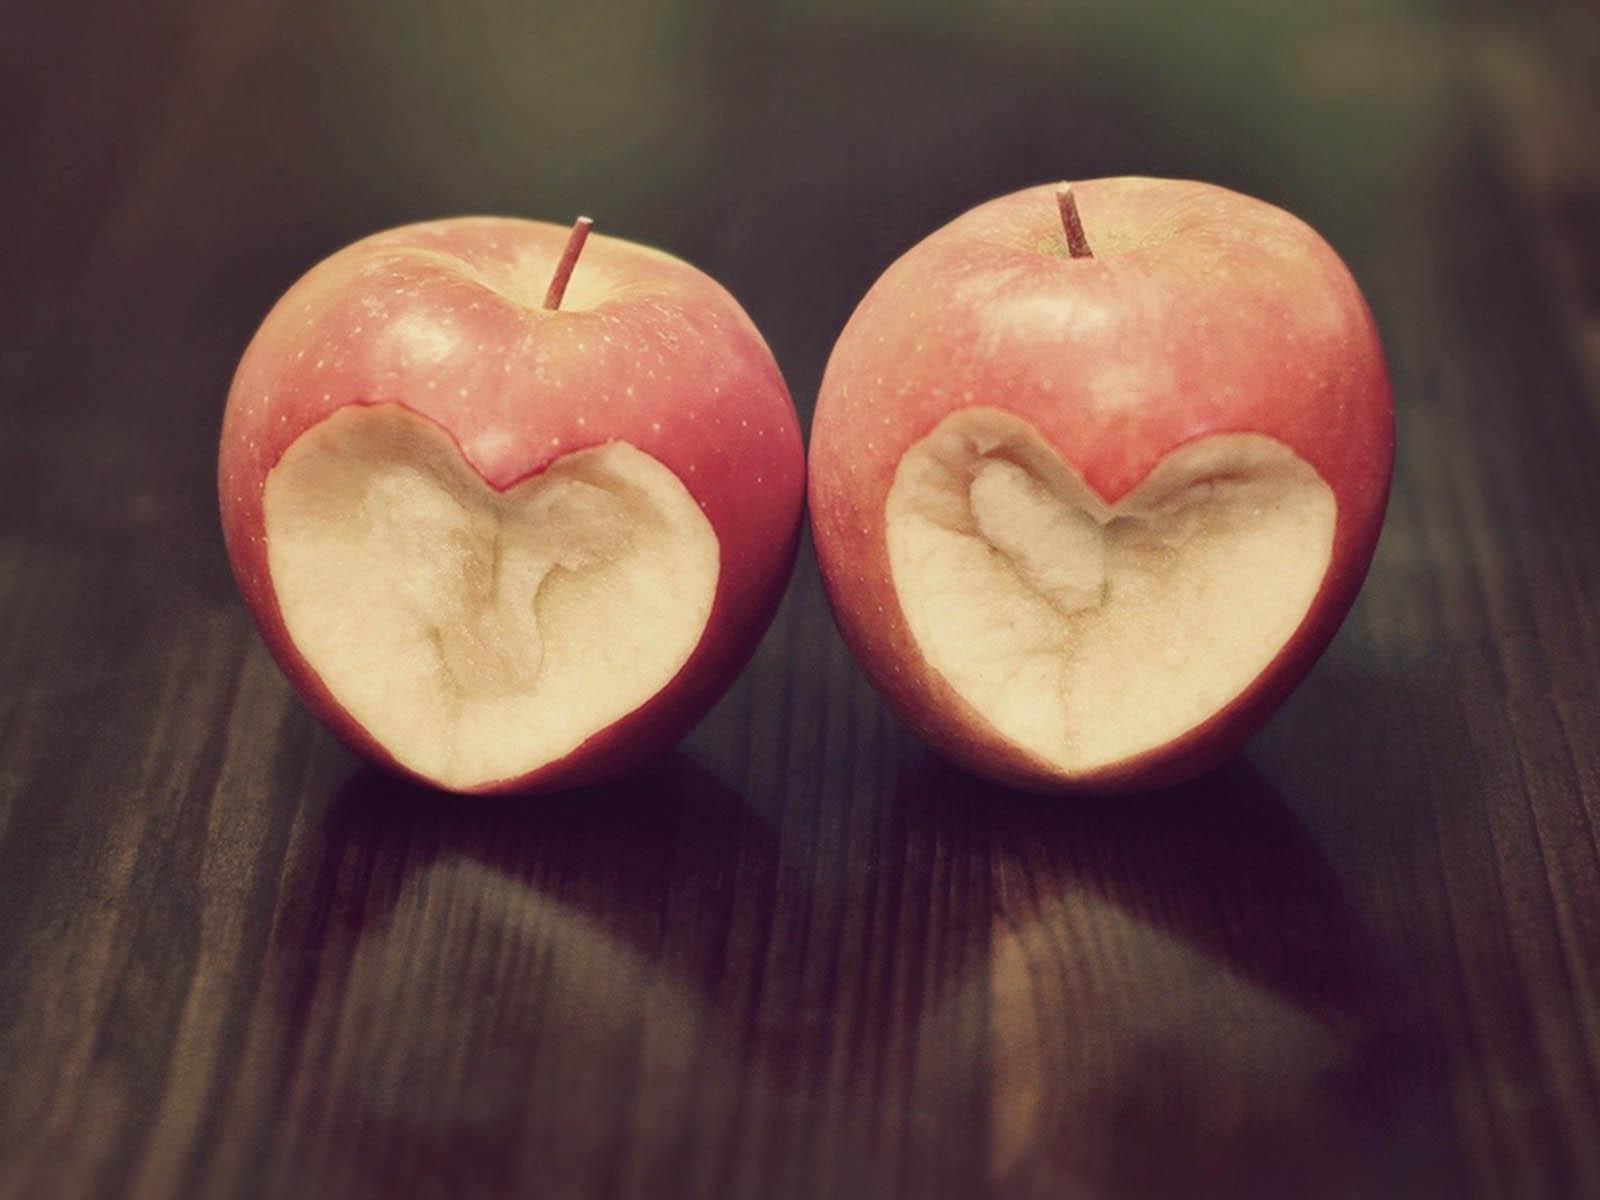 Wallpapers: Apple Love Wallpapers